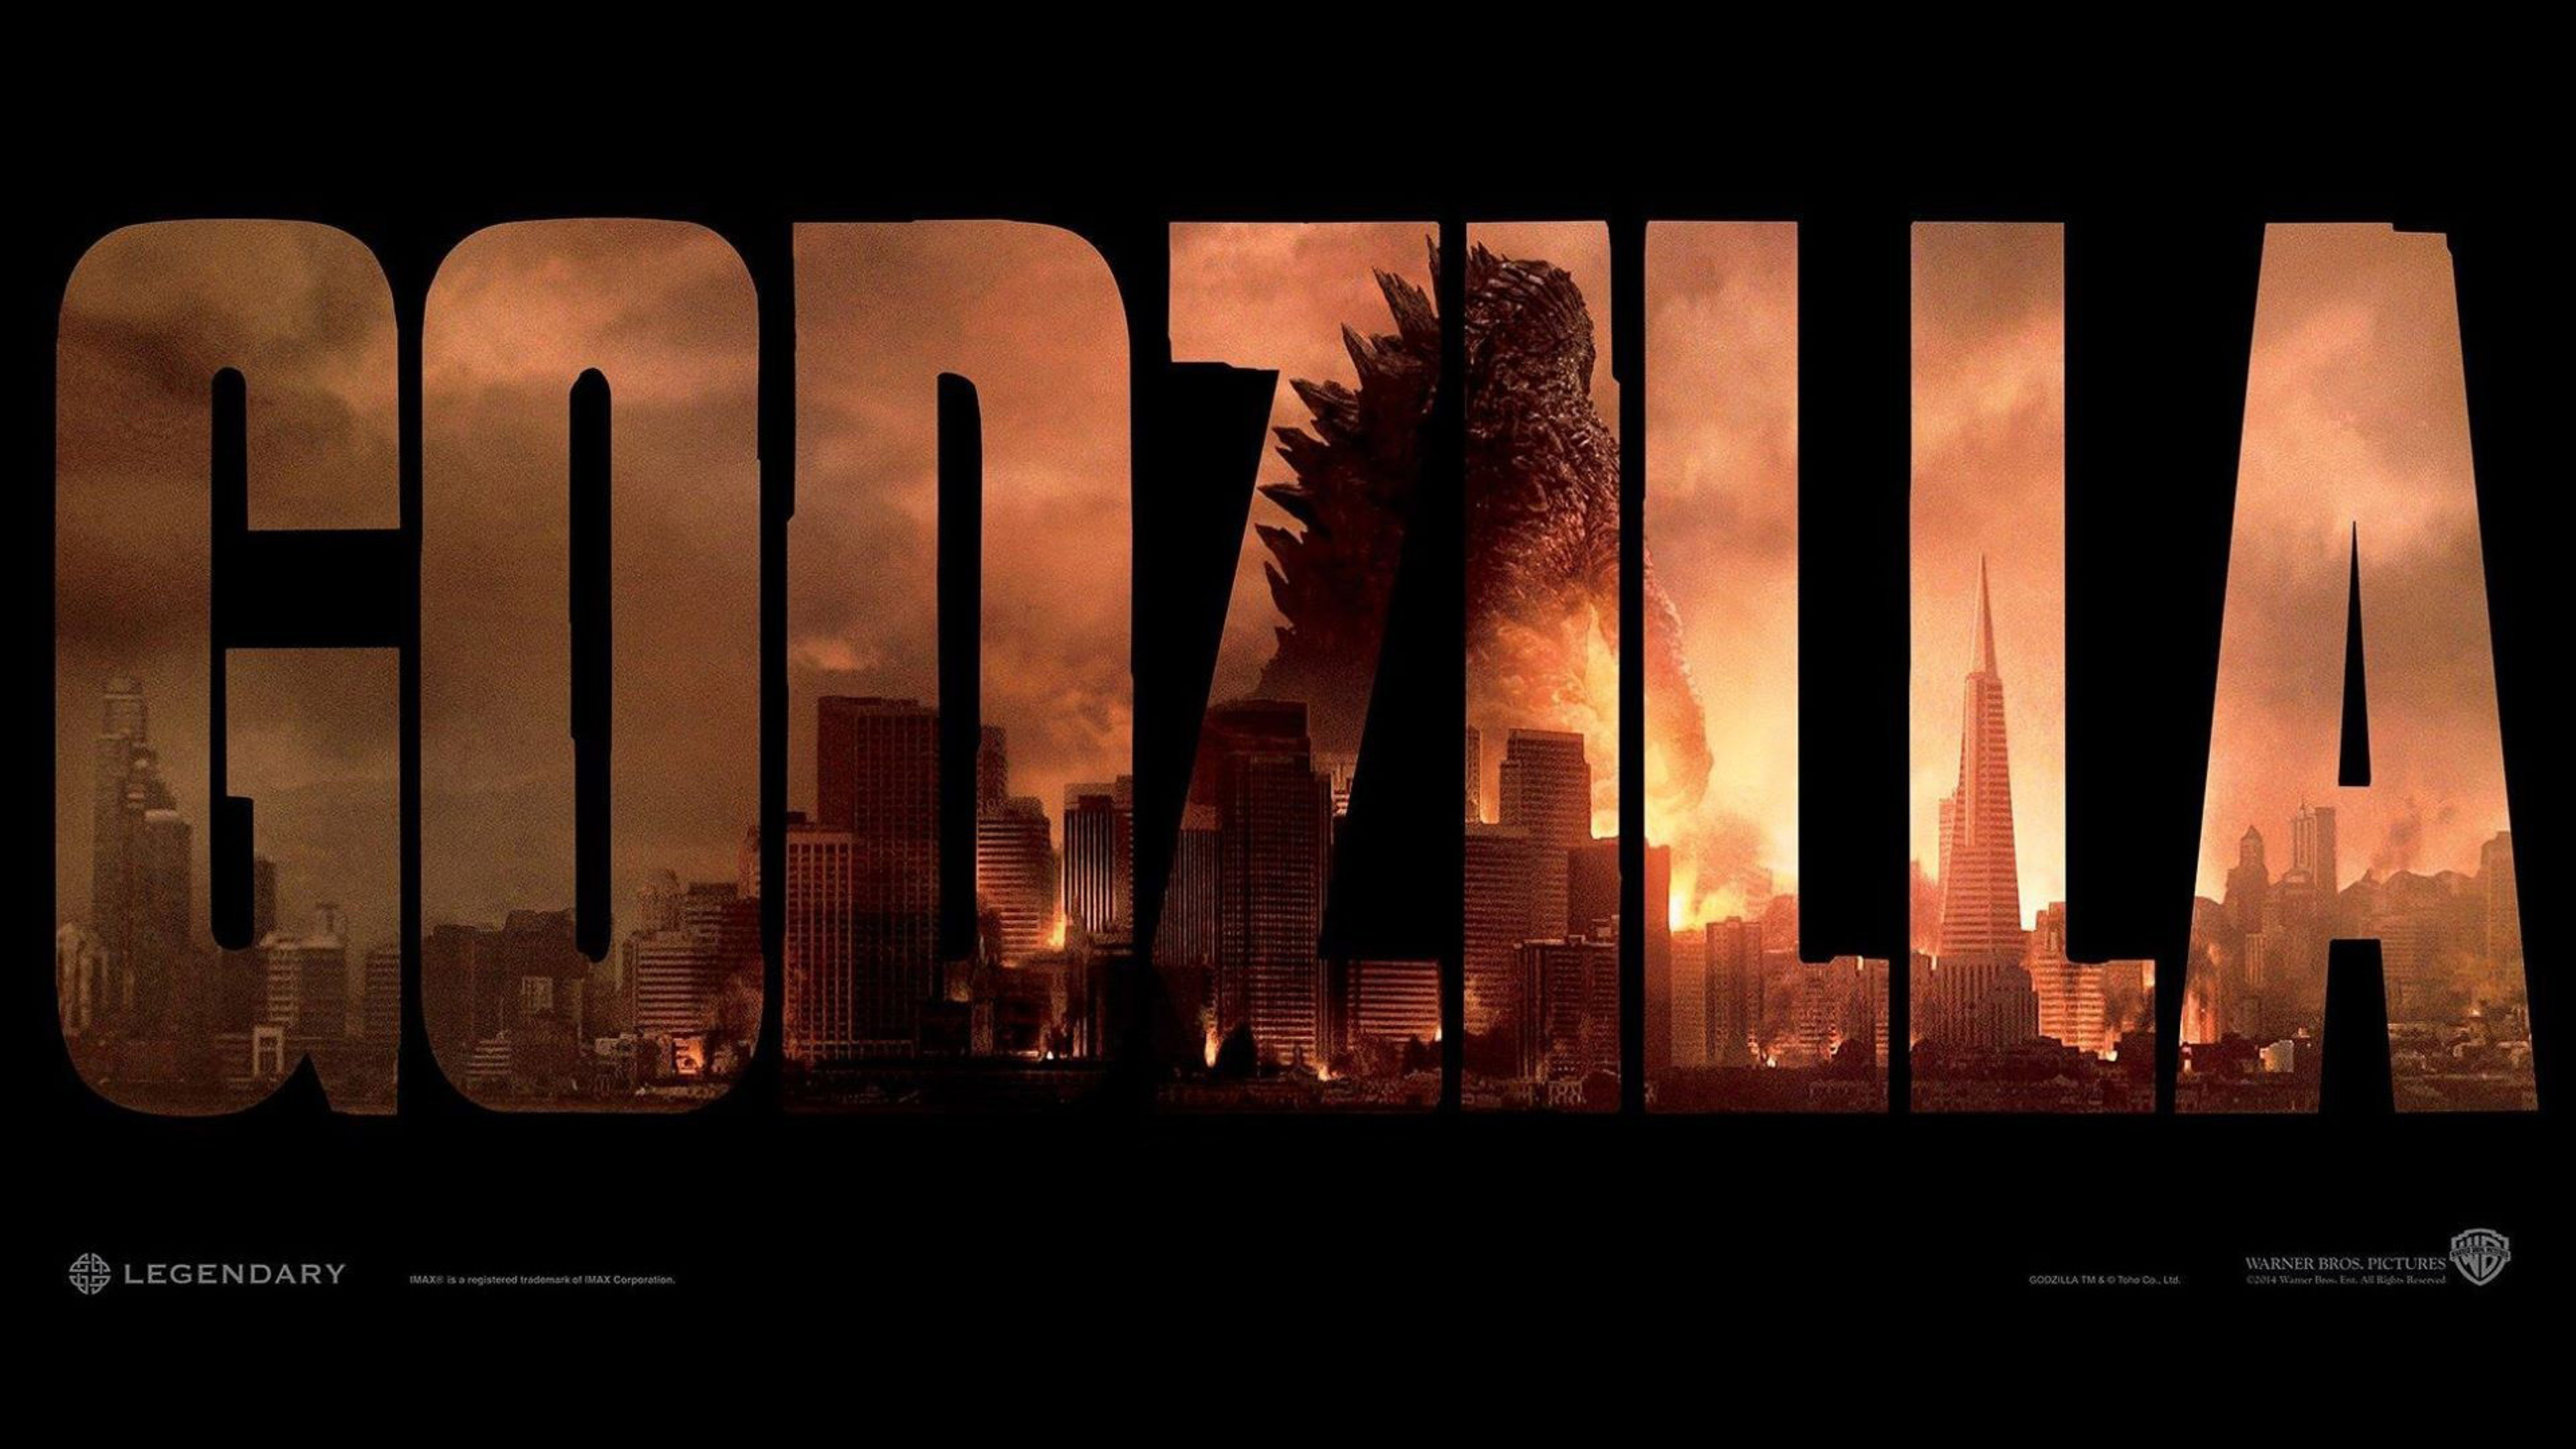 Wallpaper 4k Godzilla Movie Hd Godzilla Wallpapers Movies Wallpapers